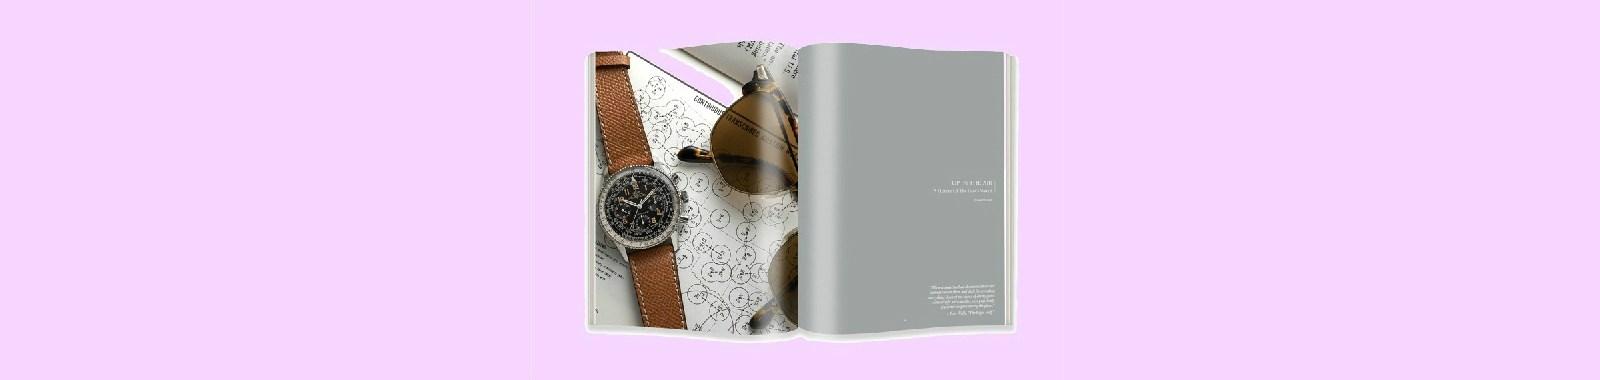 hodinkee-mainer-eye